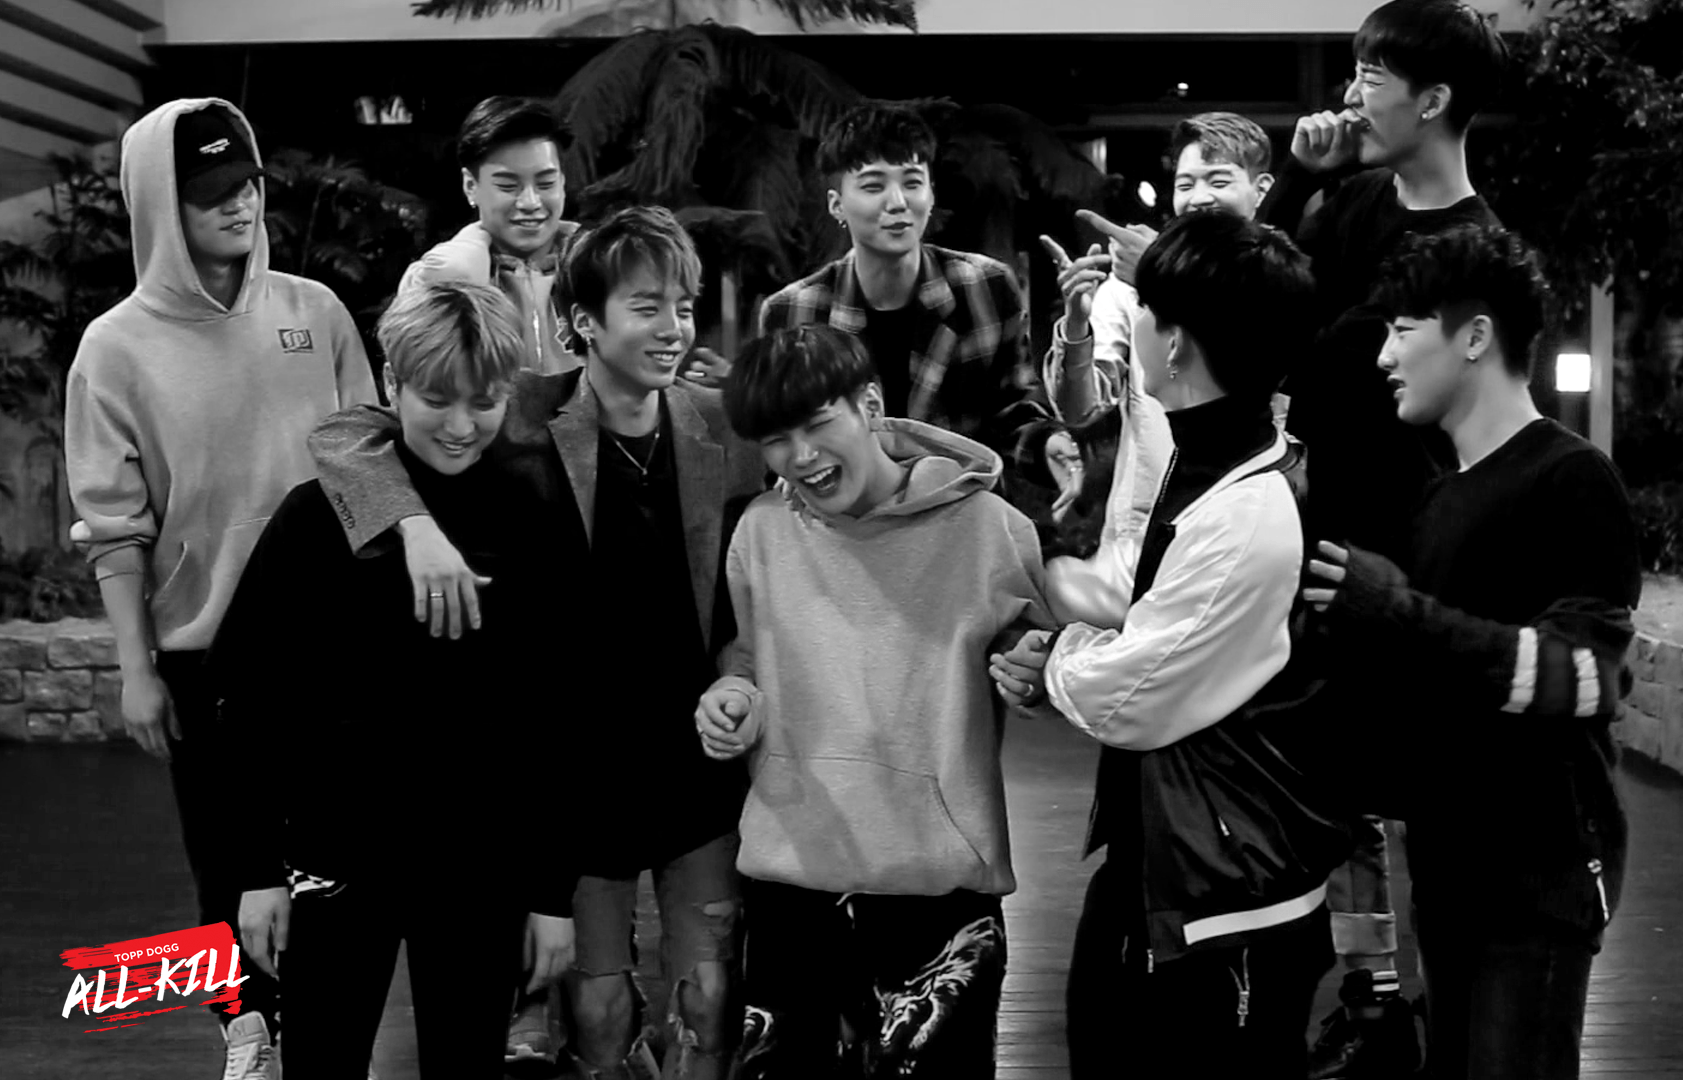 Jenissi se va de Topp Dogg, el grupo continuará con 9 miembros